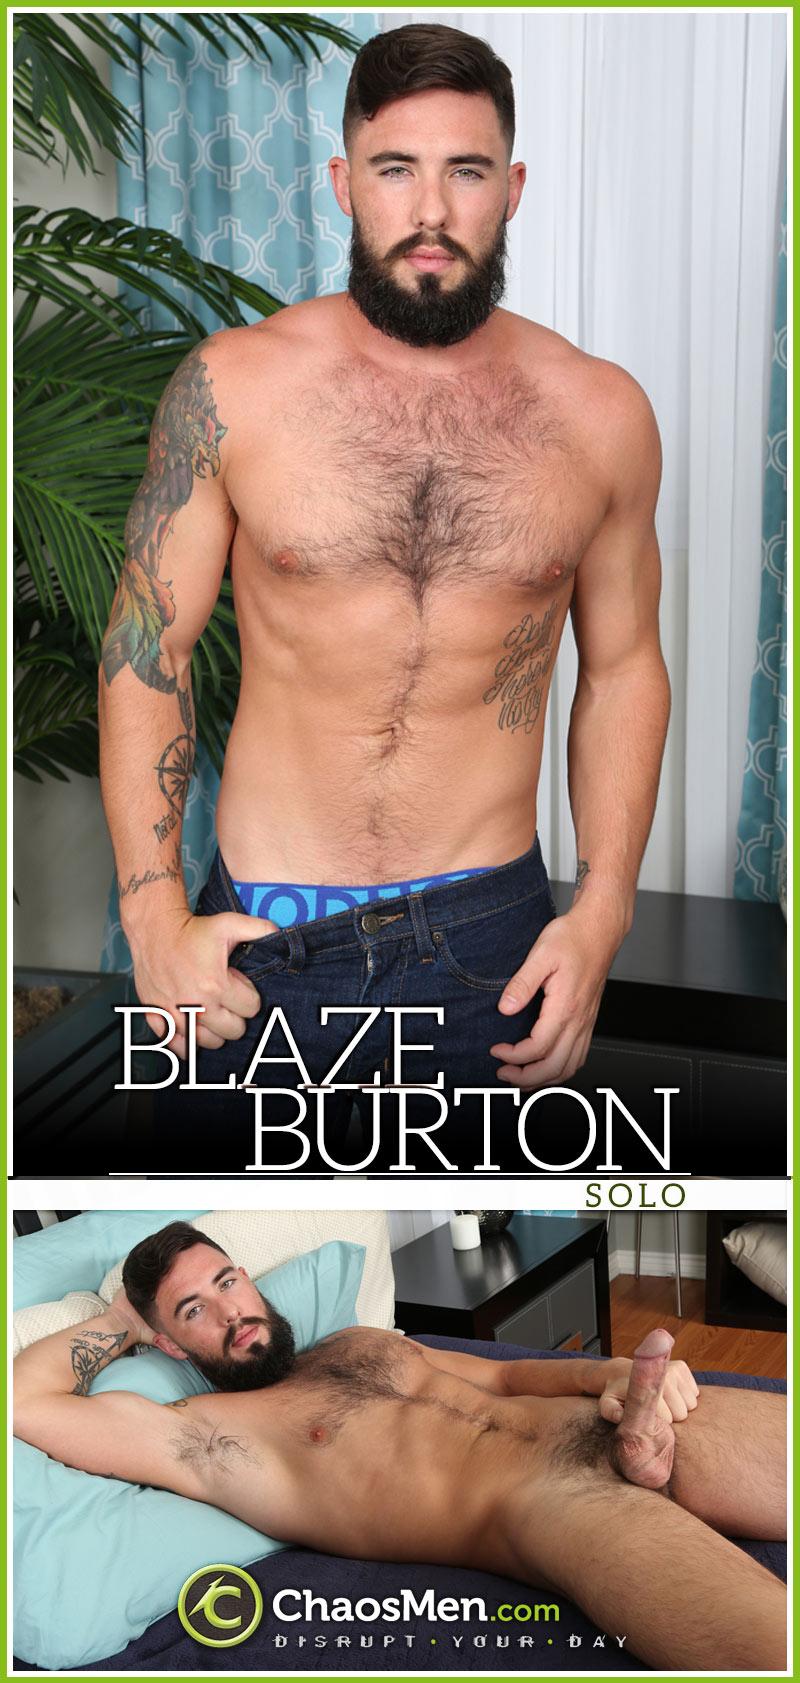 Blaze Burton at ChaosMen